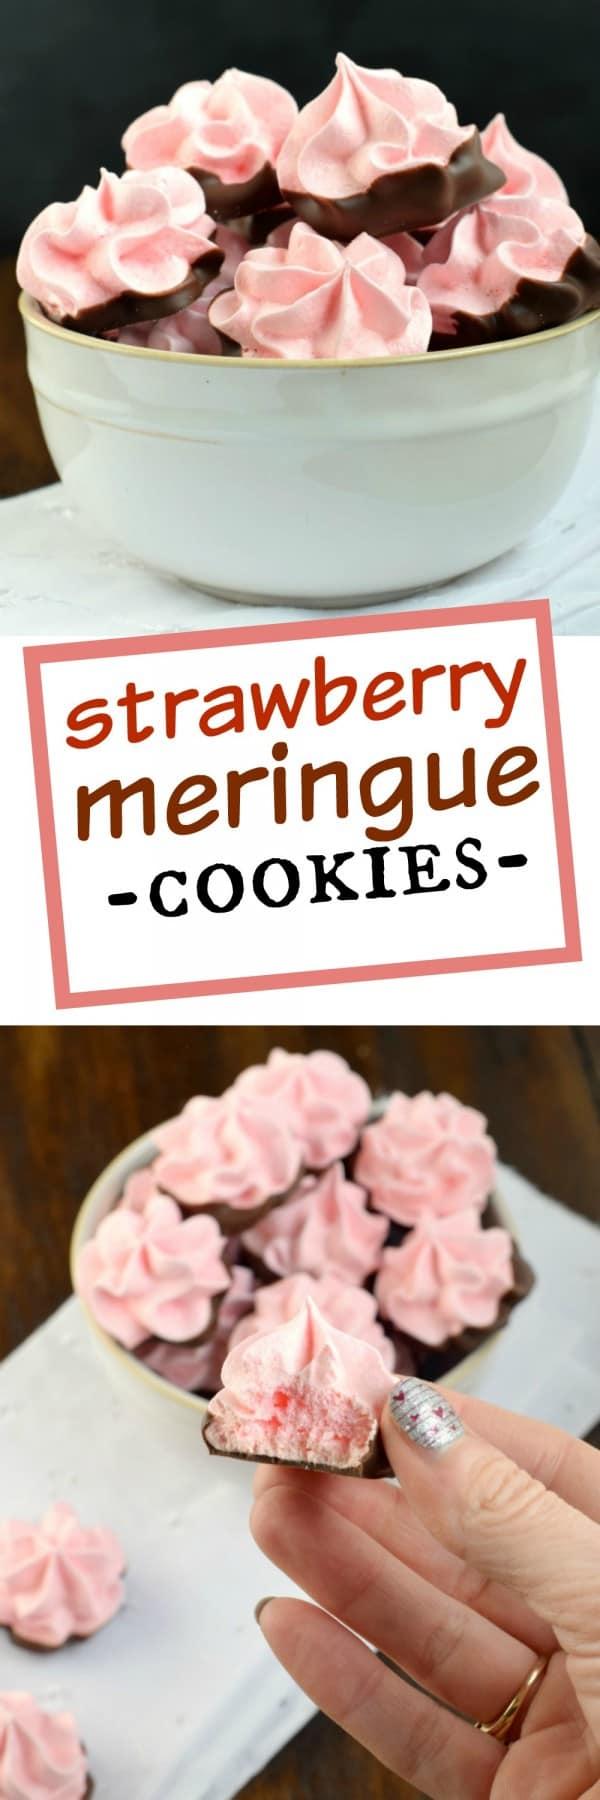 Strawberry Meringues - Shugary Sweets